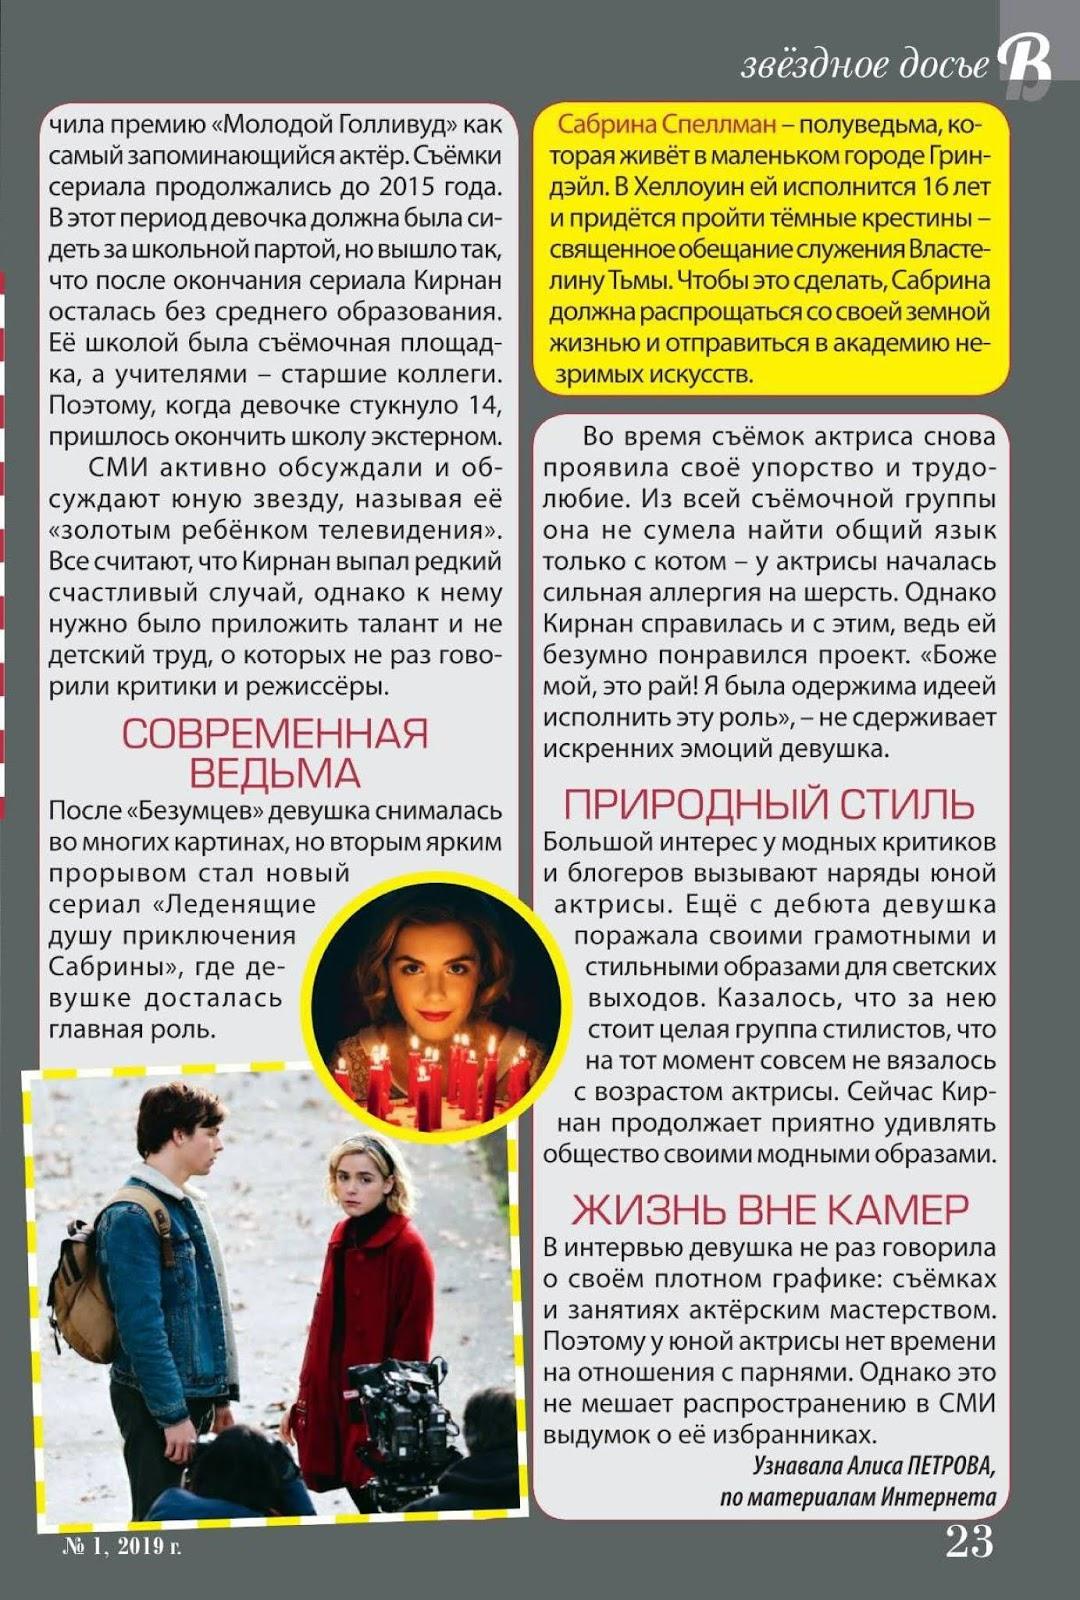 Kiernan Shipka - Волшебный Russia - January 2019